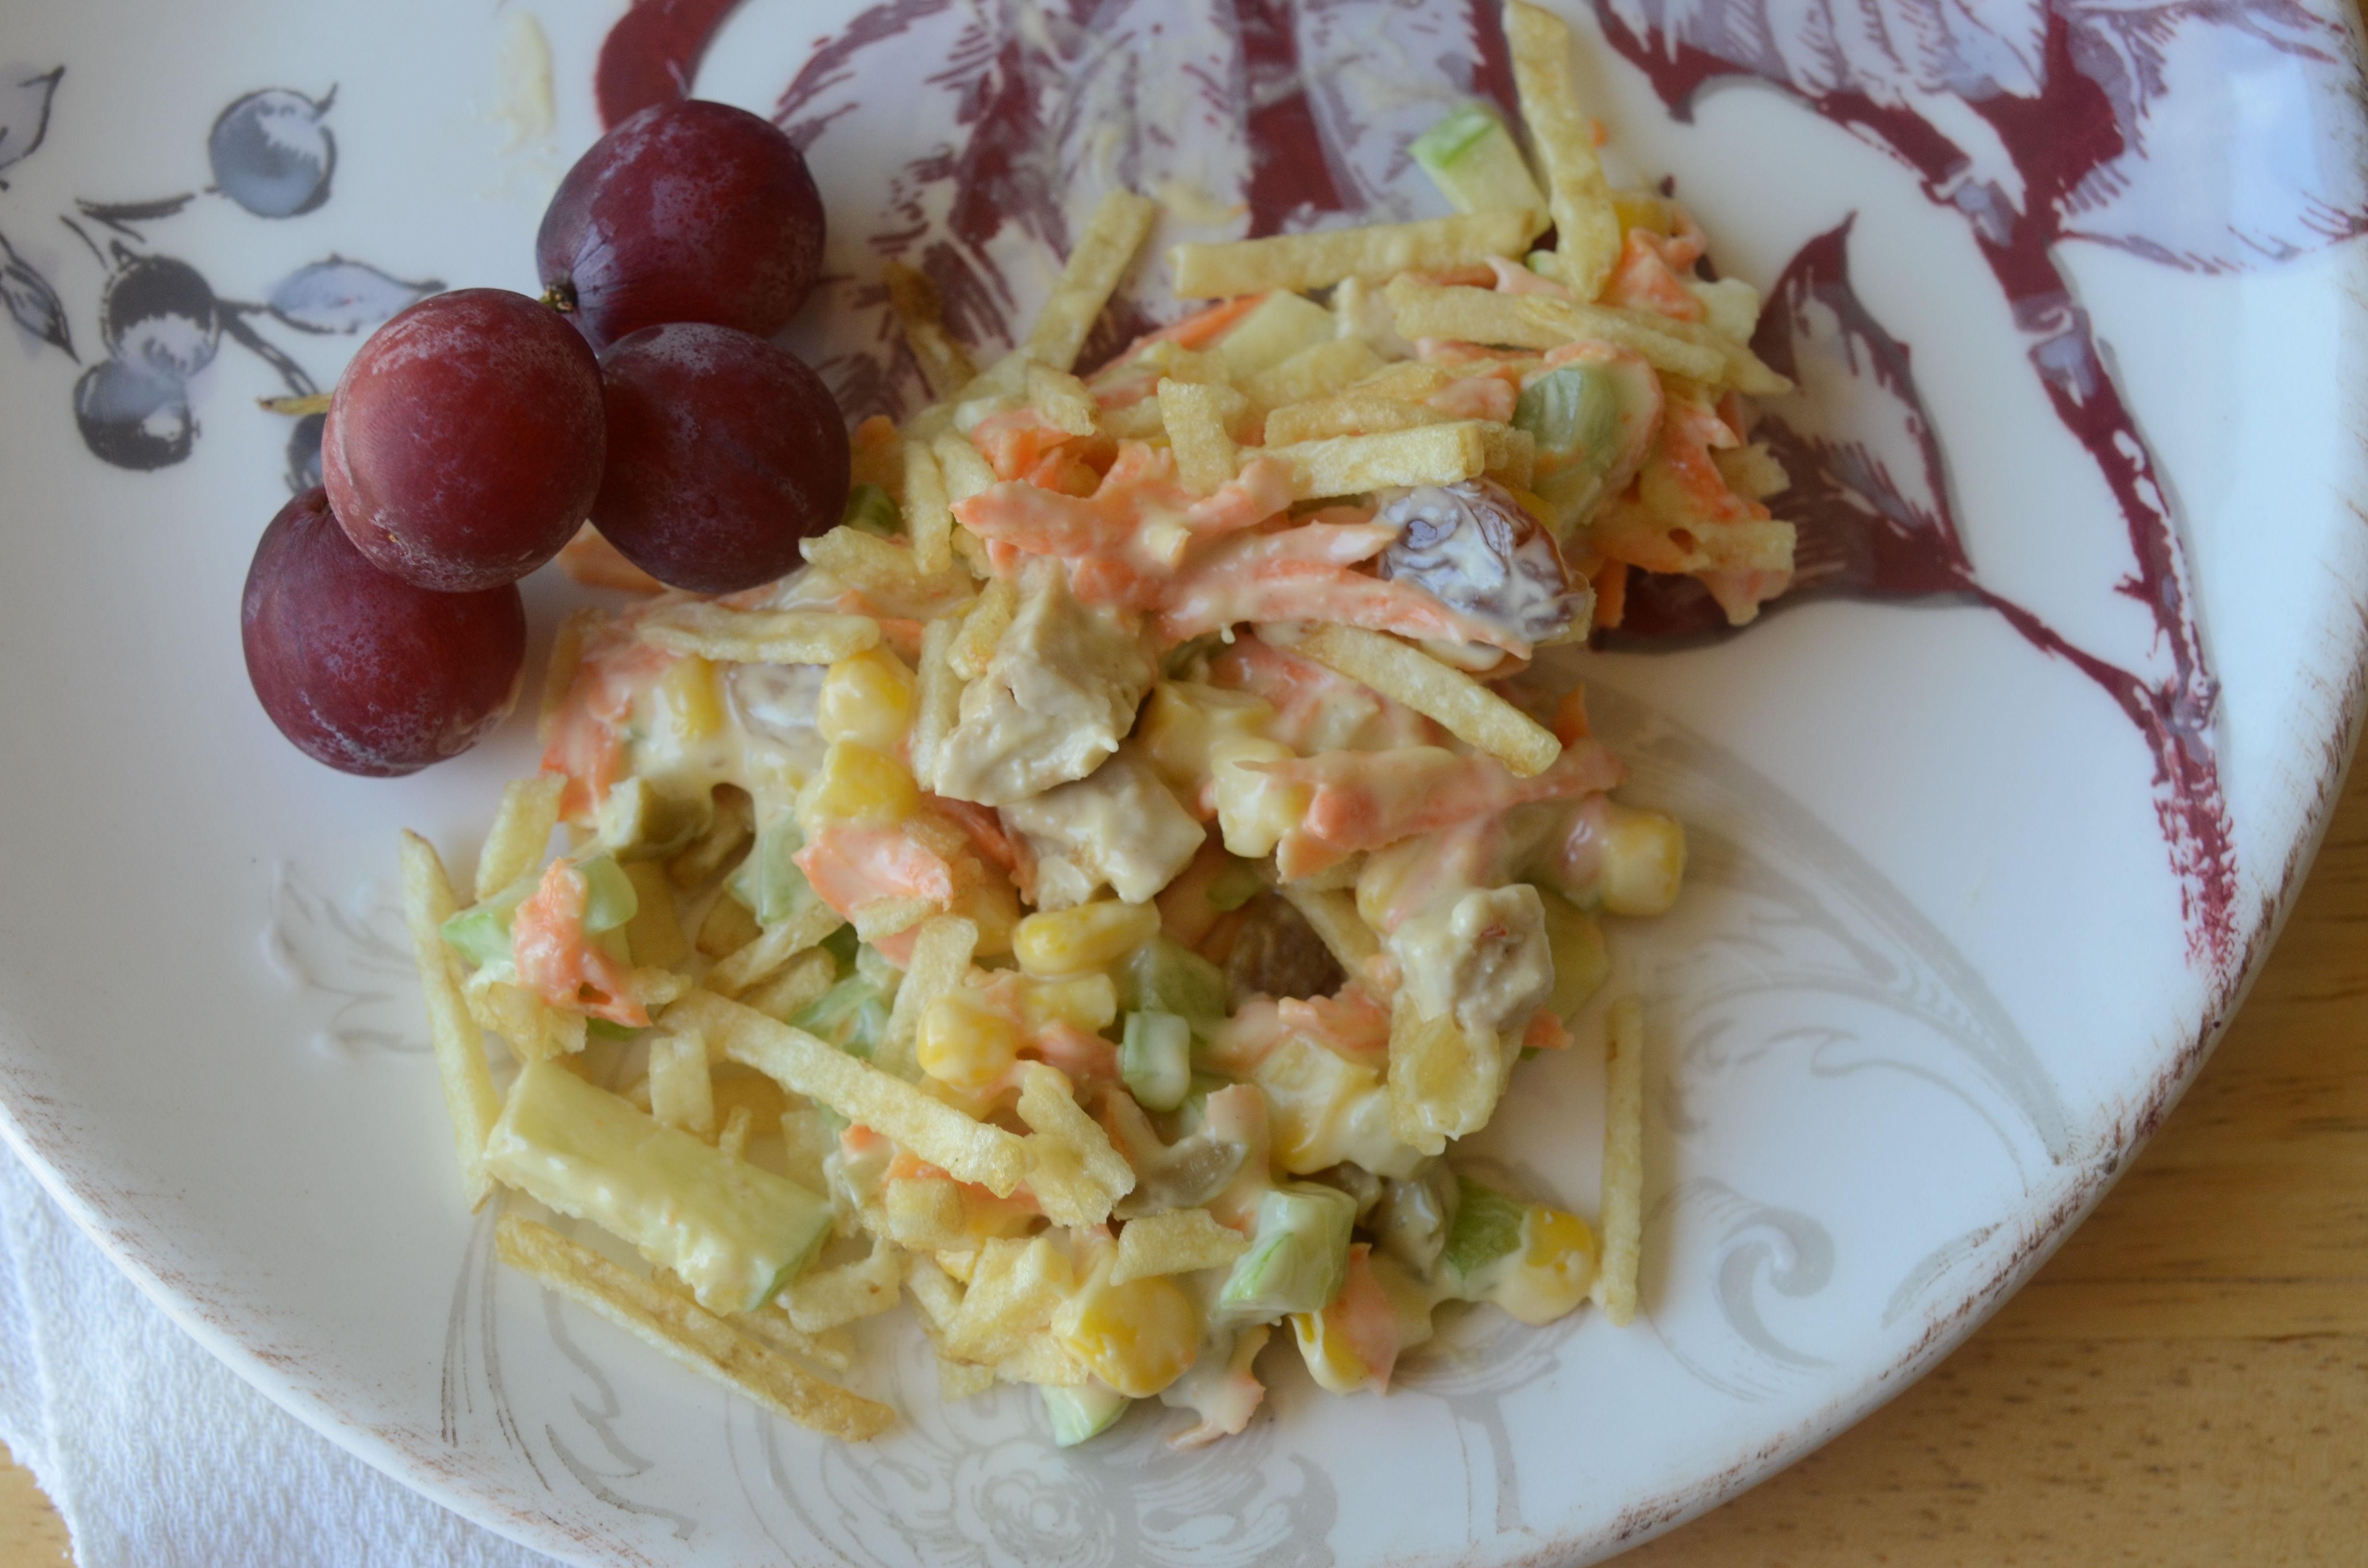 Brazilian Chicken Salad (Salpicao de Frango) Rita